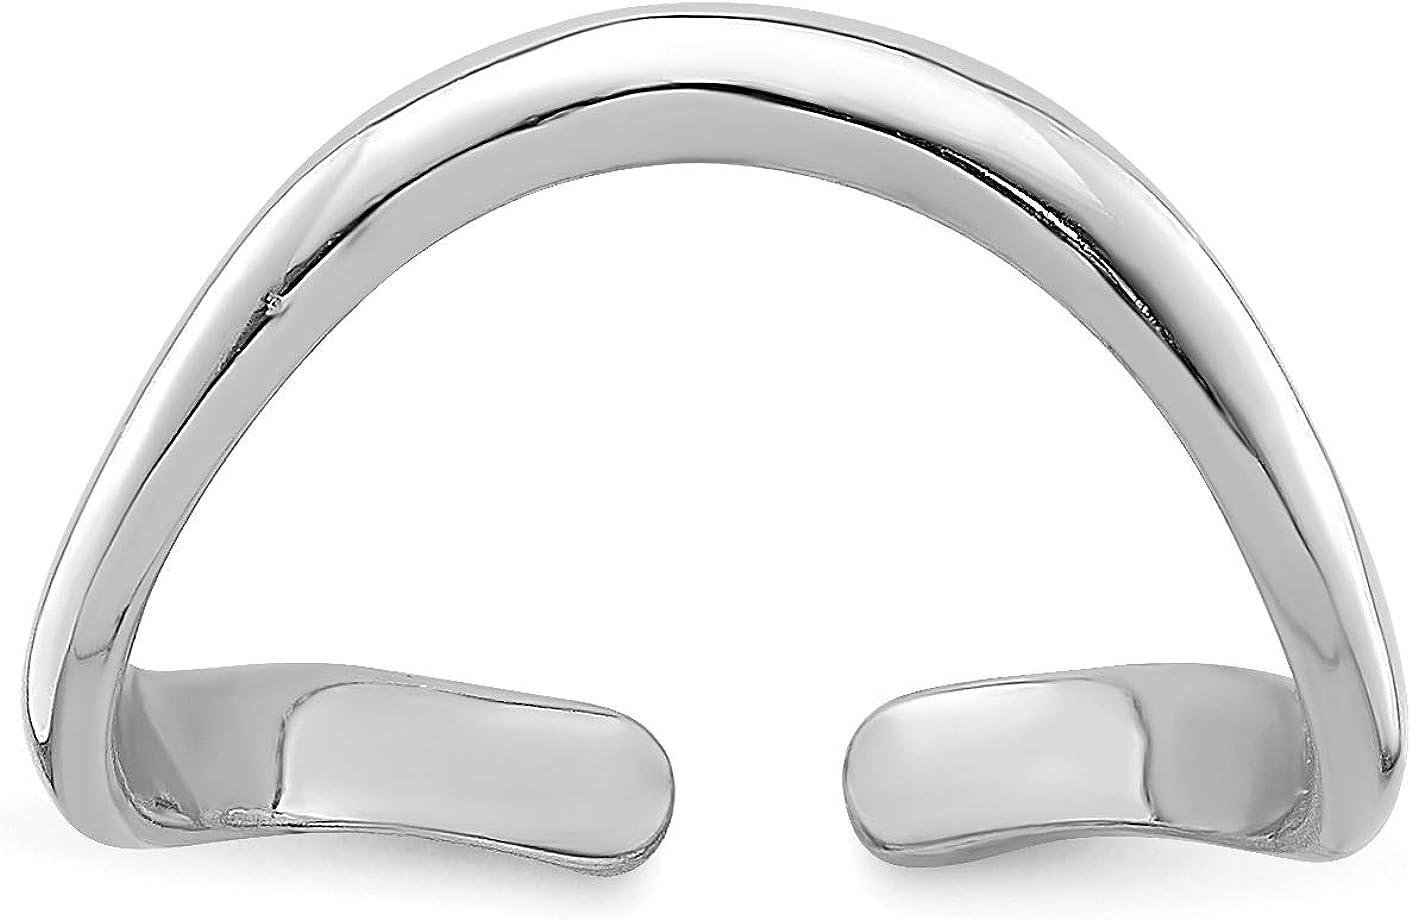 14k White Gold Polished Single Curved Wave Toe Ring